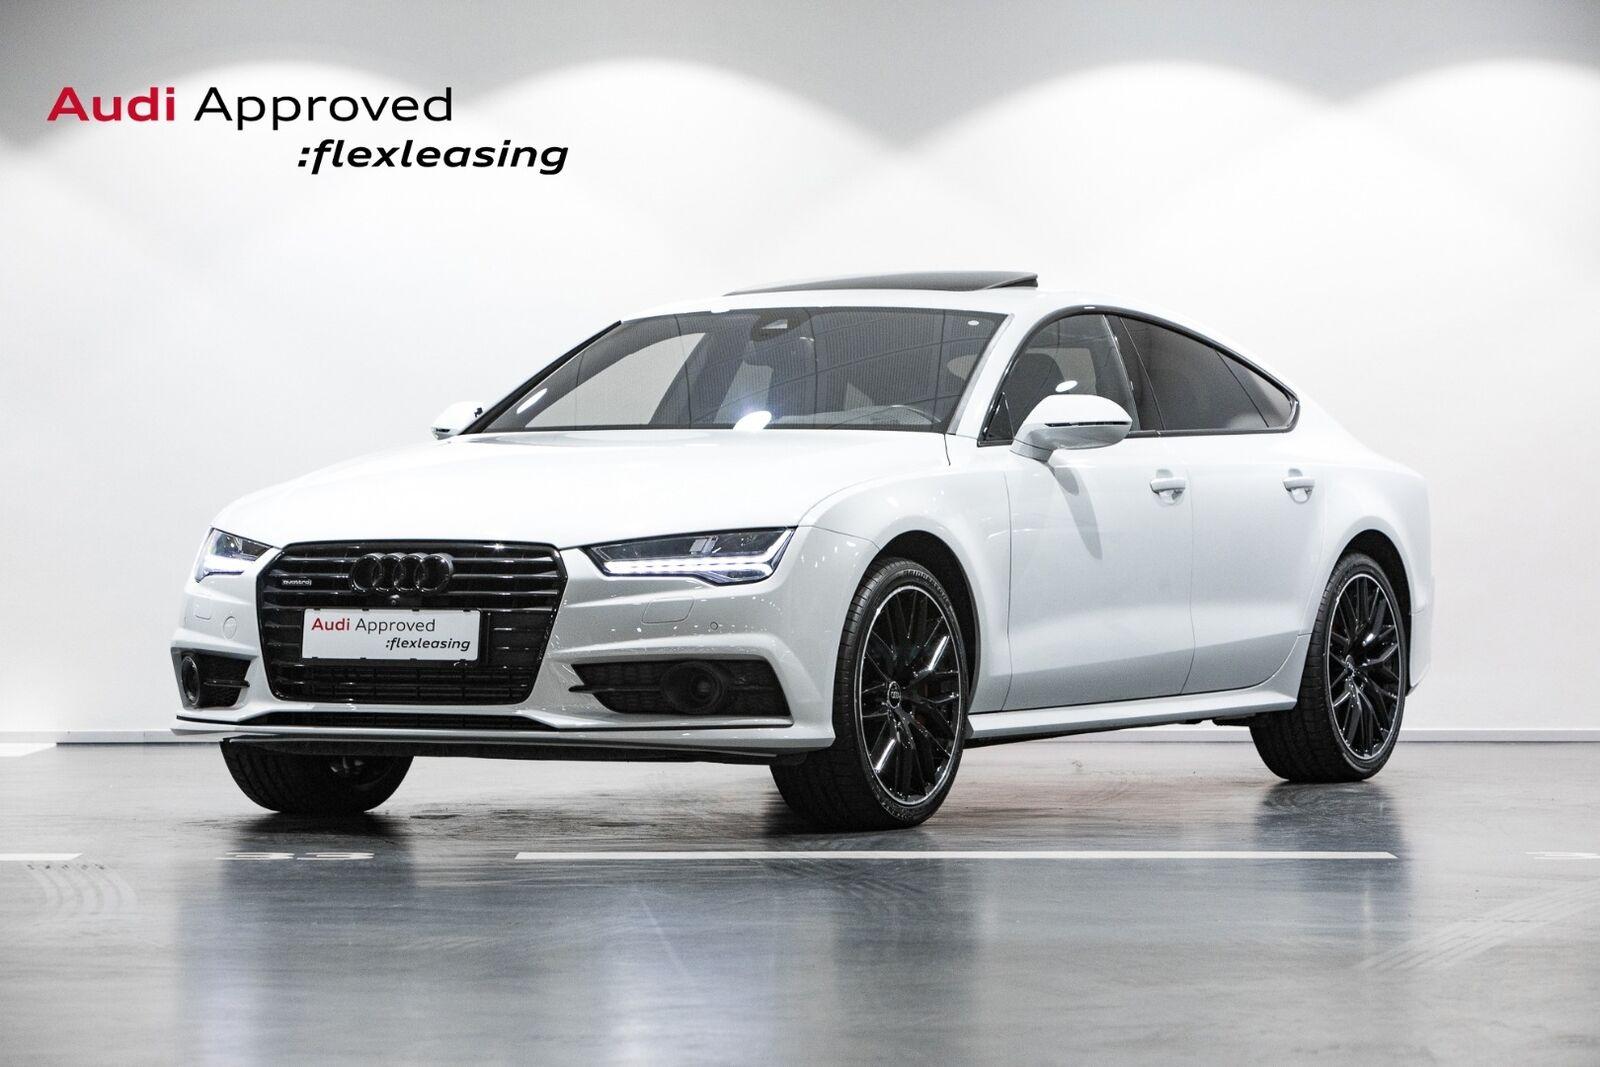 Audi A7 3,0 TDi 326 Sportback quattro Tiptr. 5d - 3.960 kr.